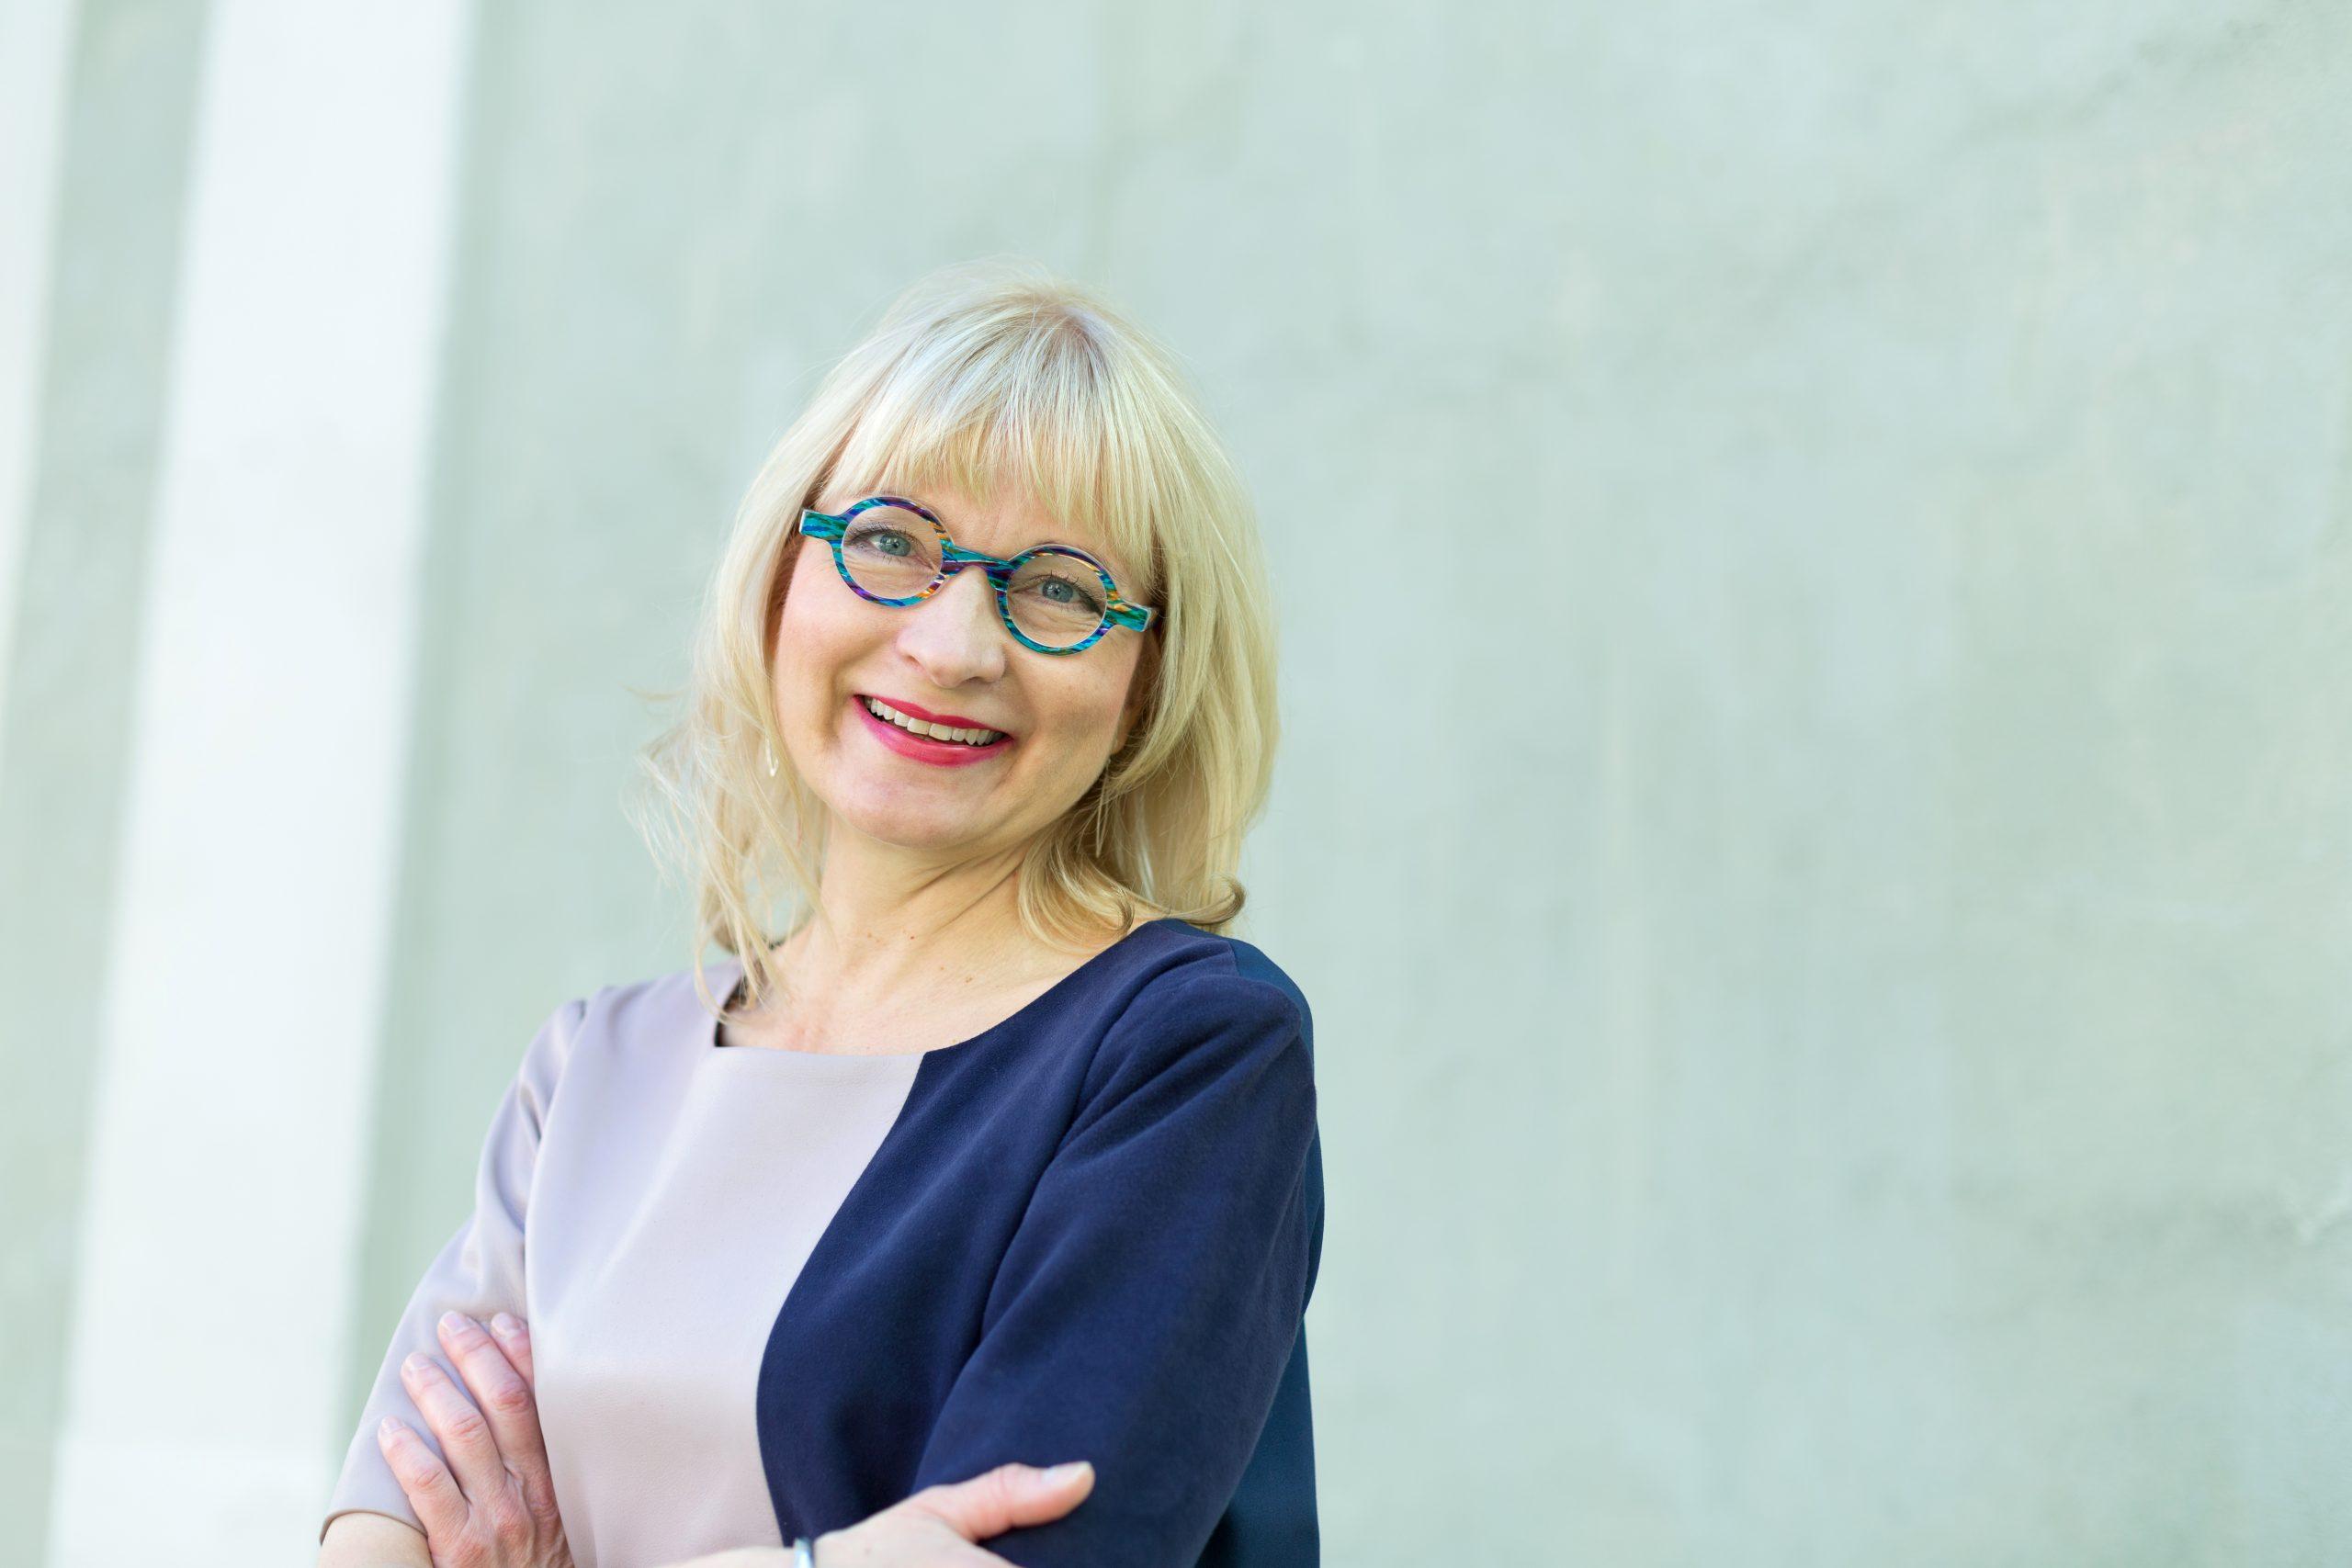 Portrait of Päivi Sillanaukee, Permanent Secretary in the Finnish Ministry of Social Affairs and Health